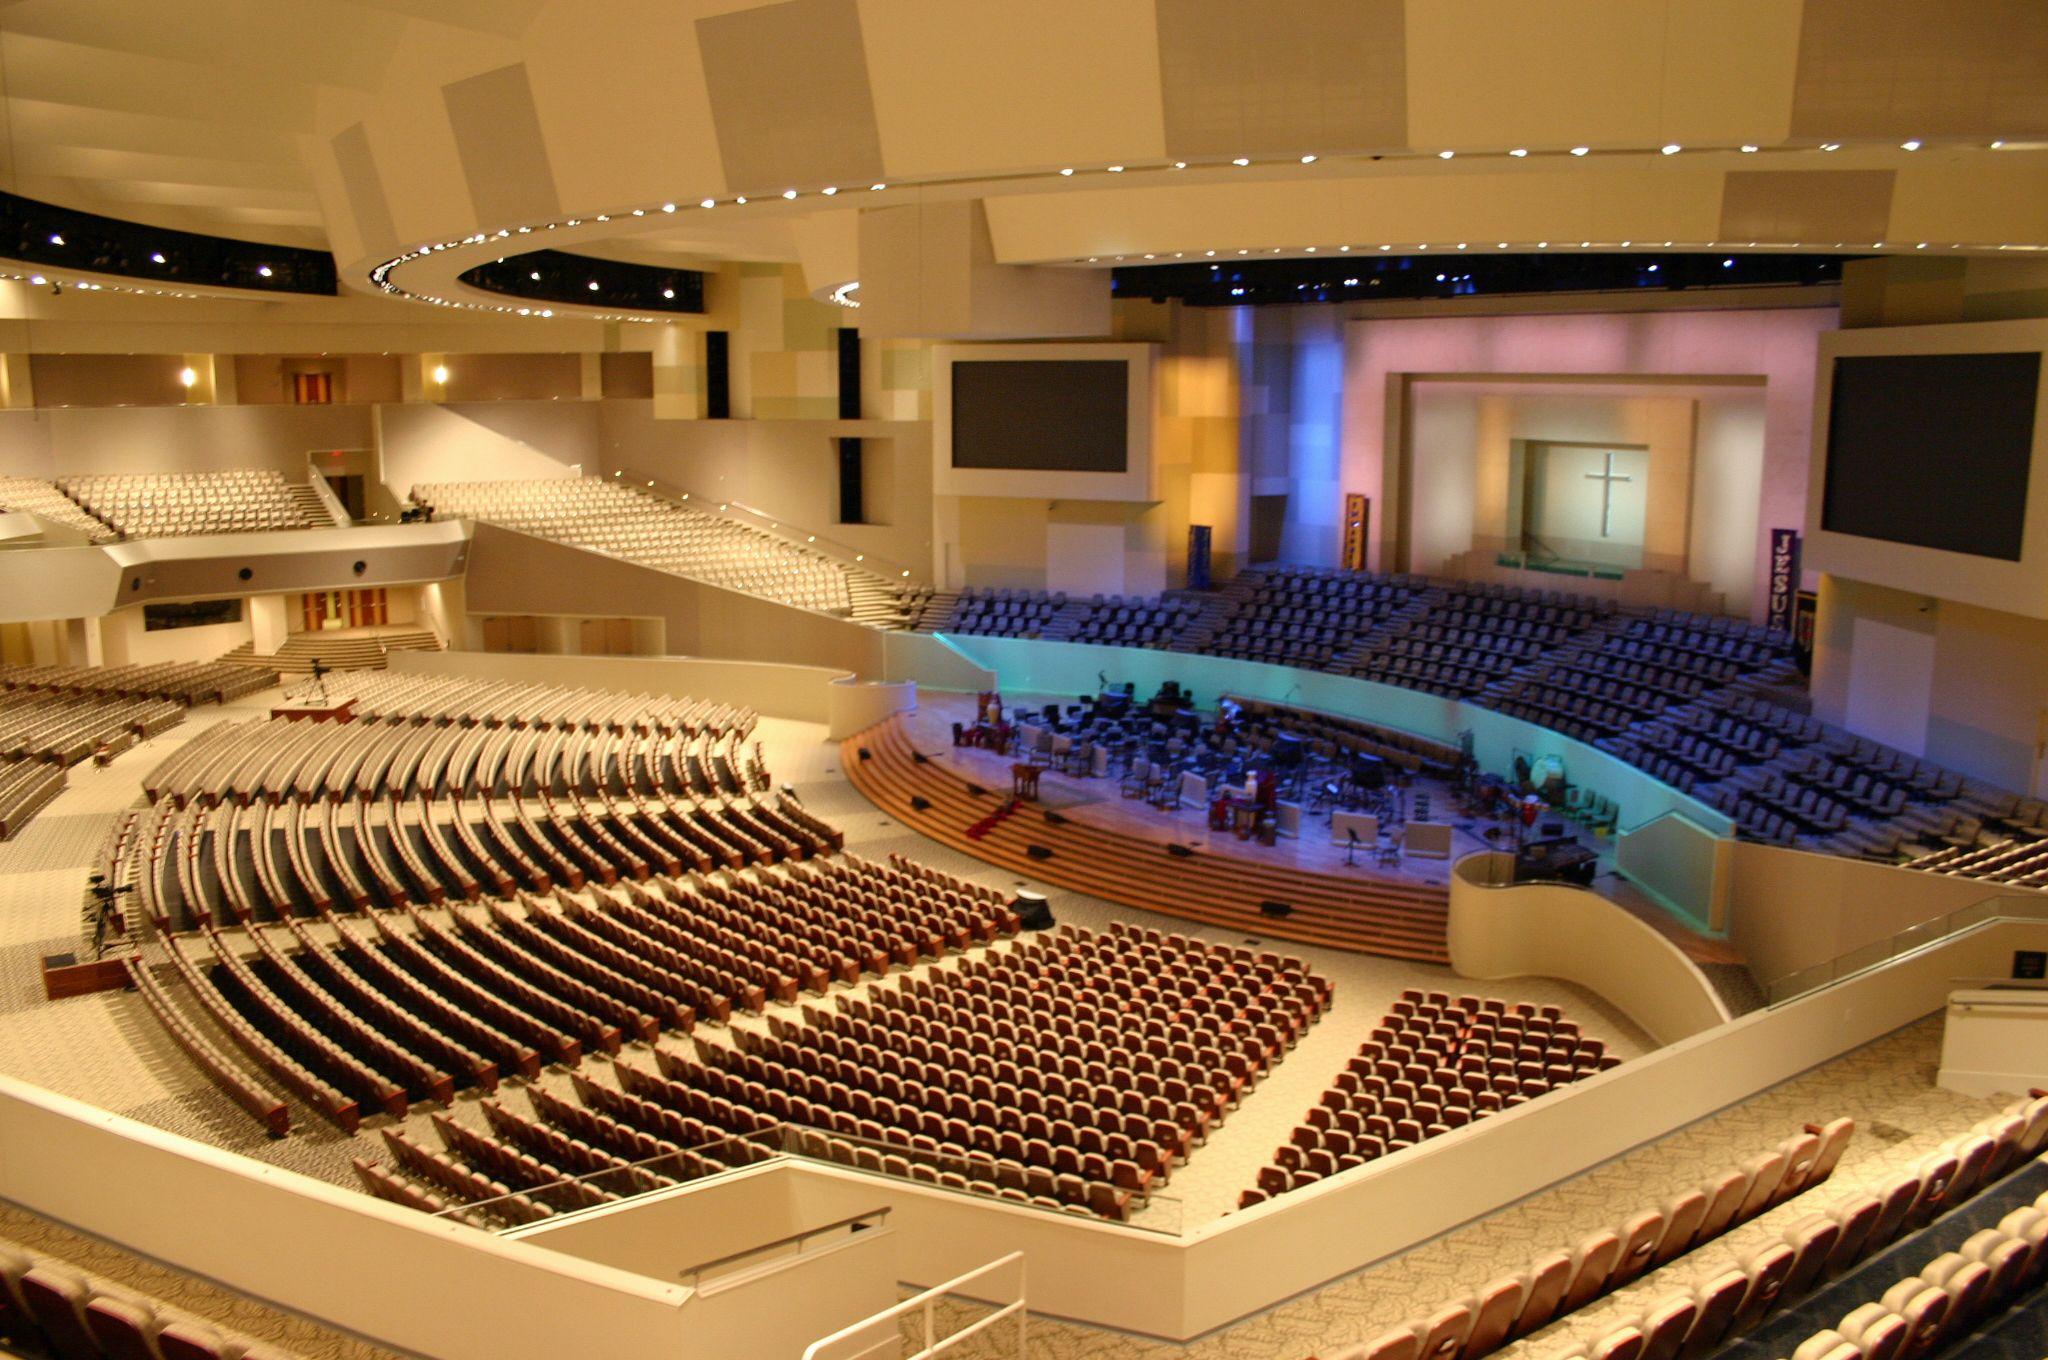 baptist church interior design - Google Search